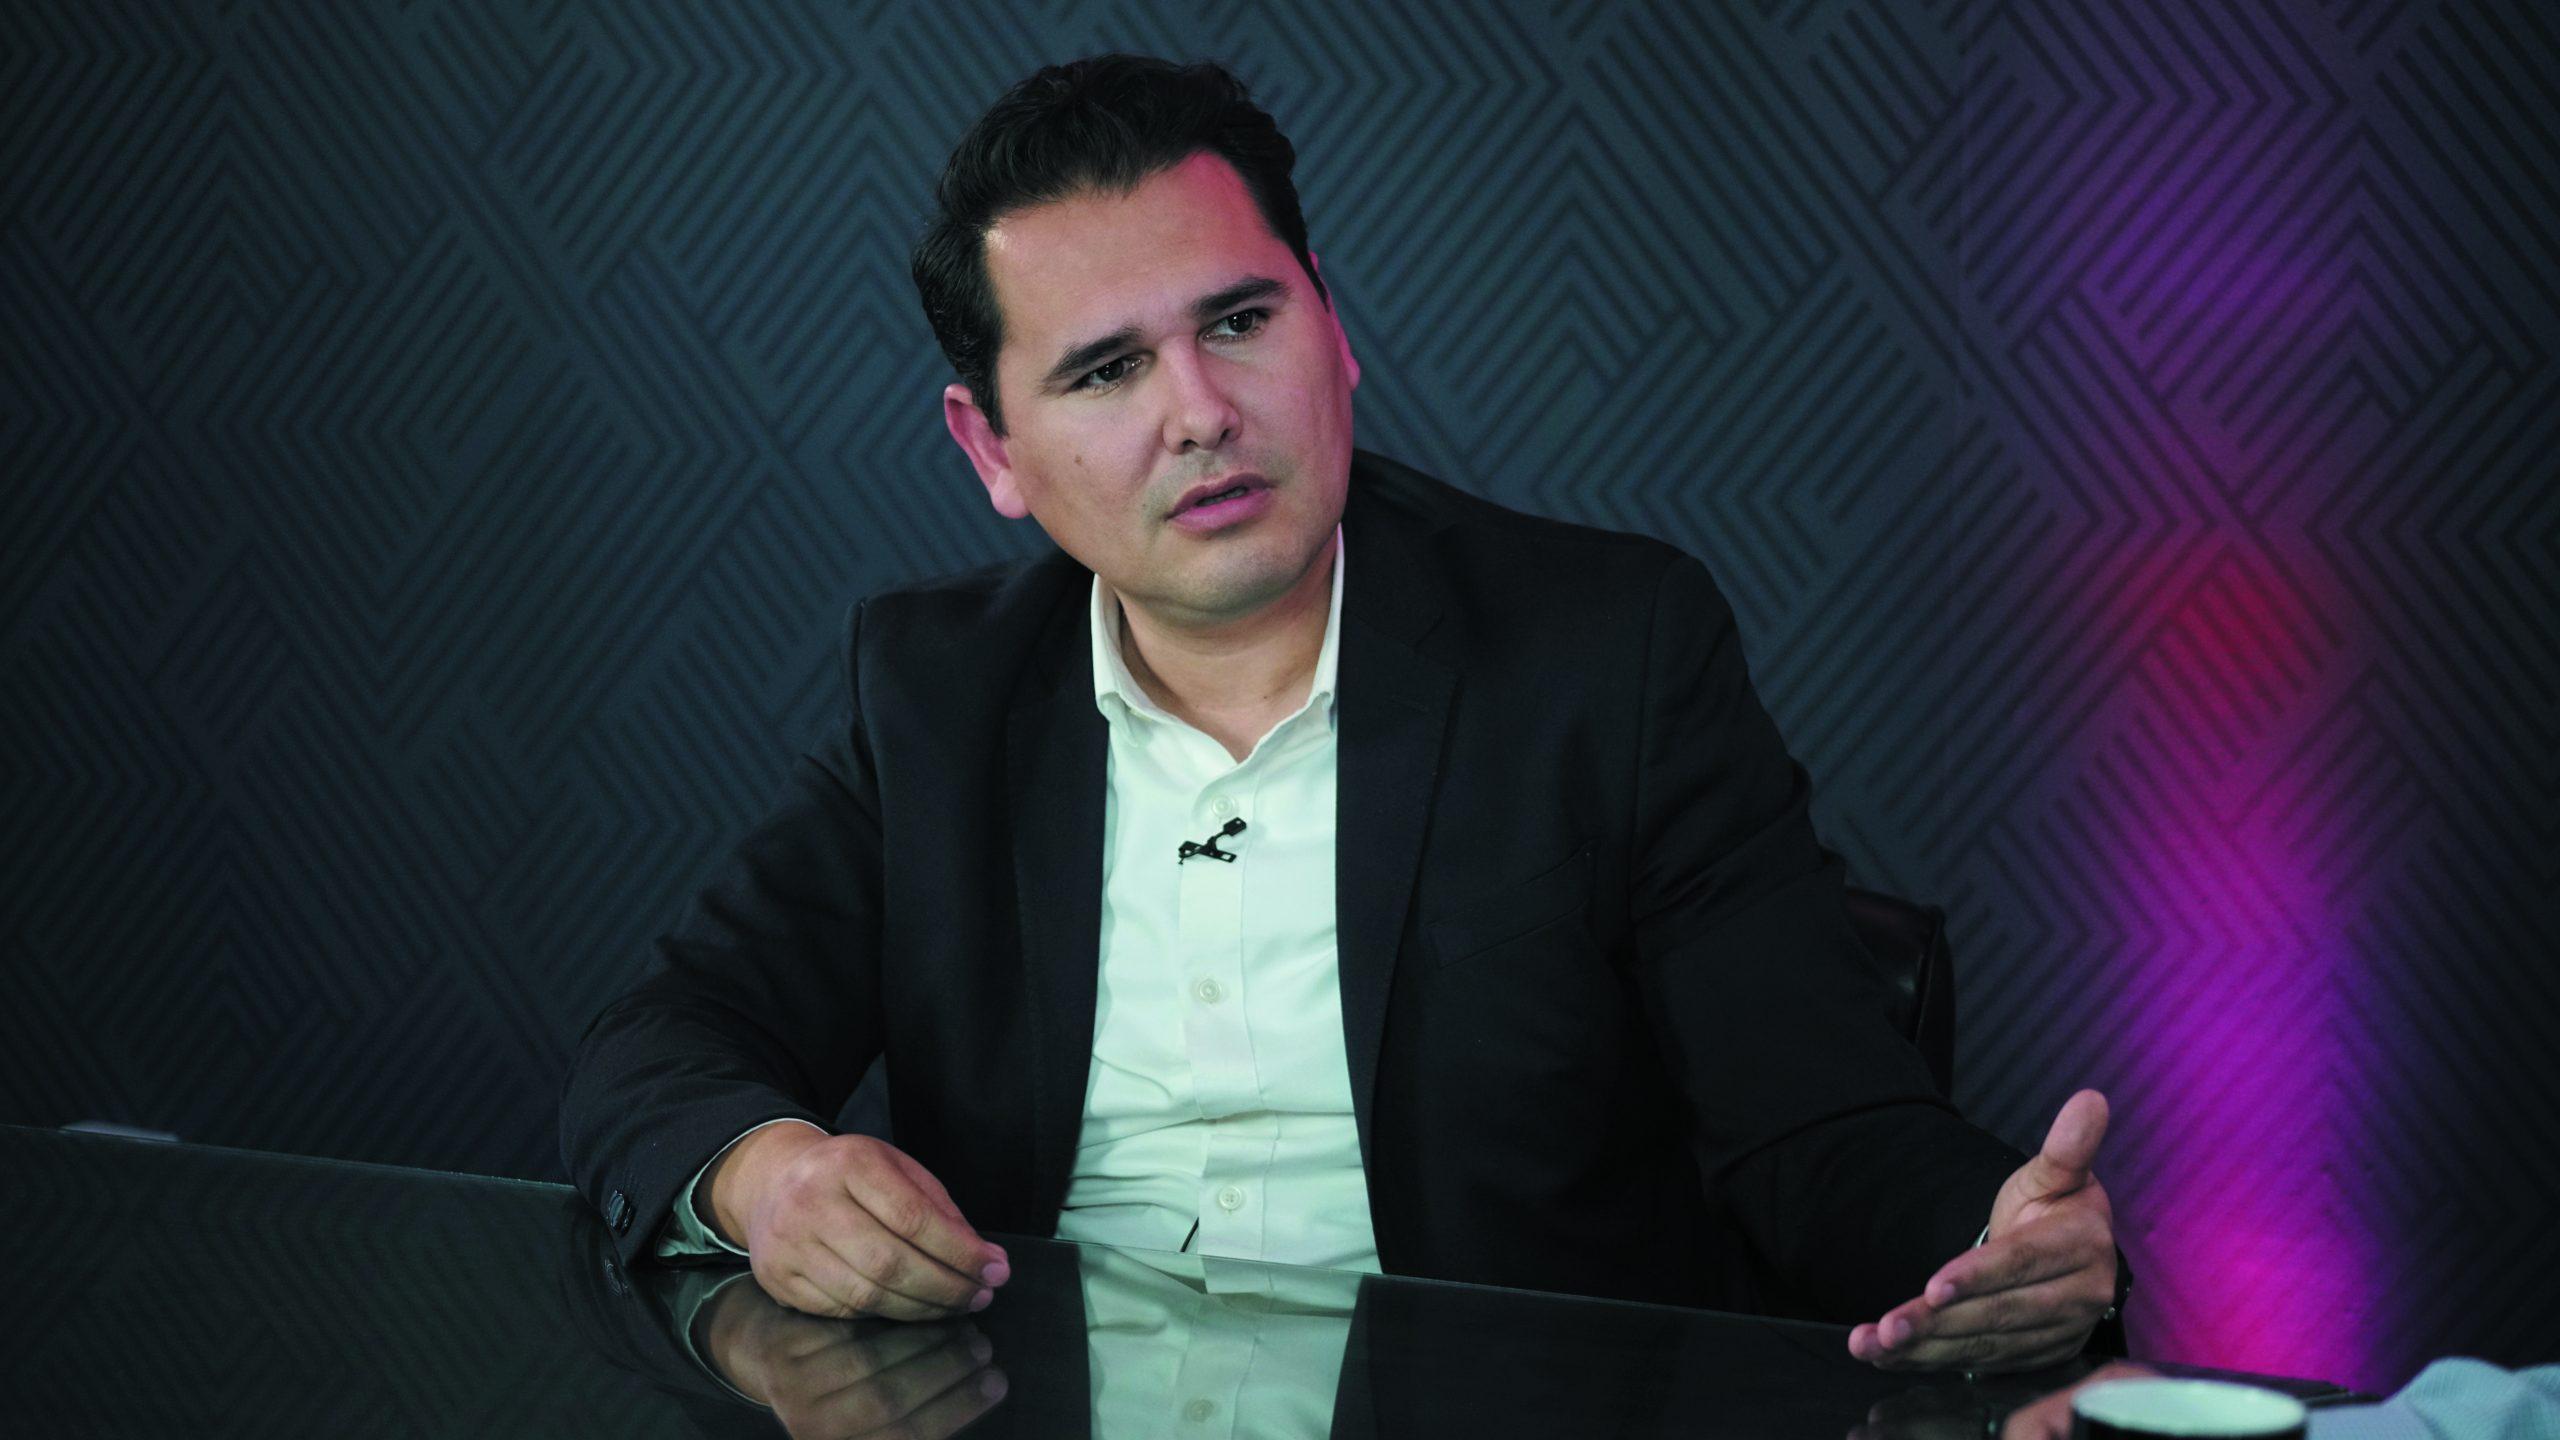 En Morena levantaremos un segundo tsunamielectoral en Sonora: Adolfo Salazar